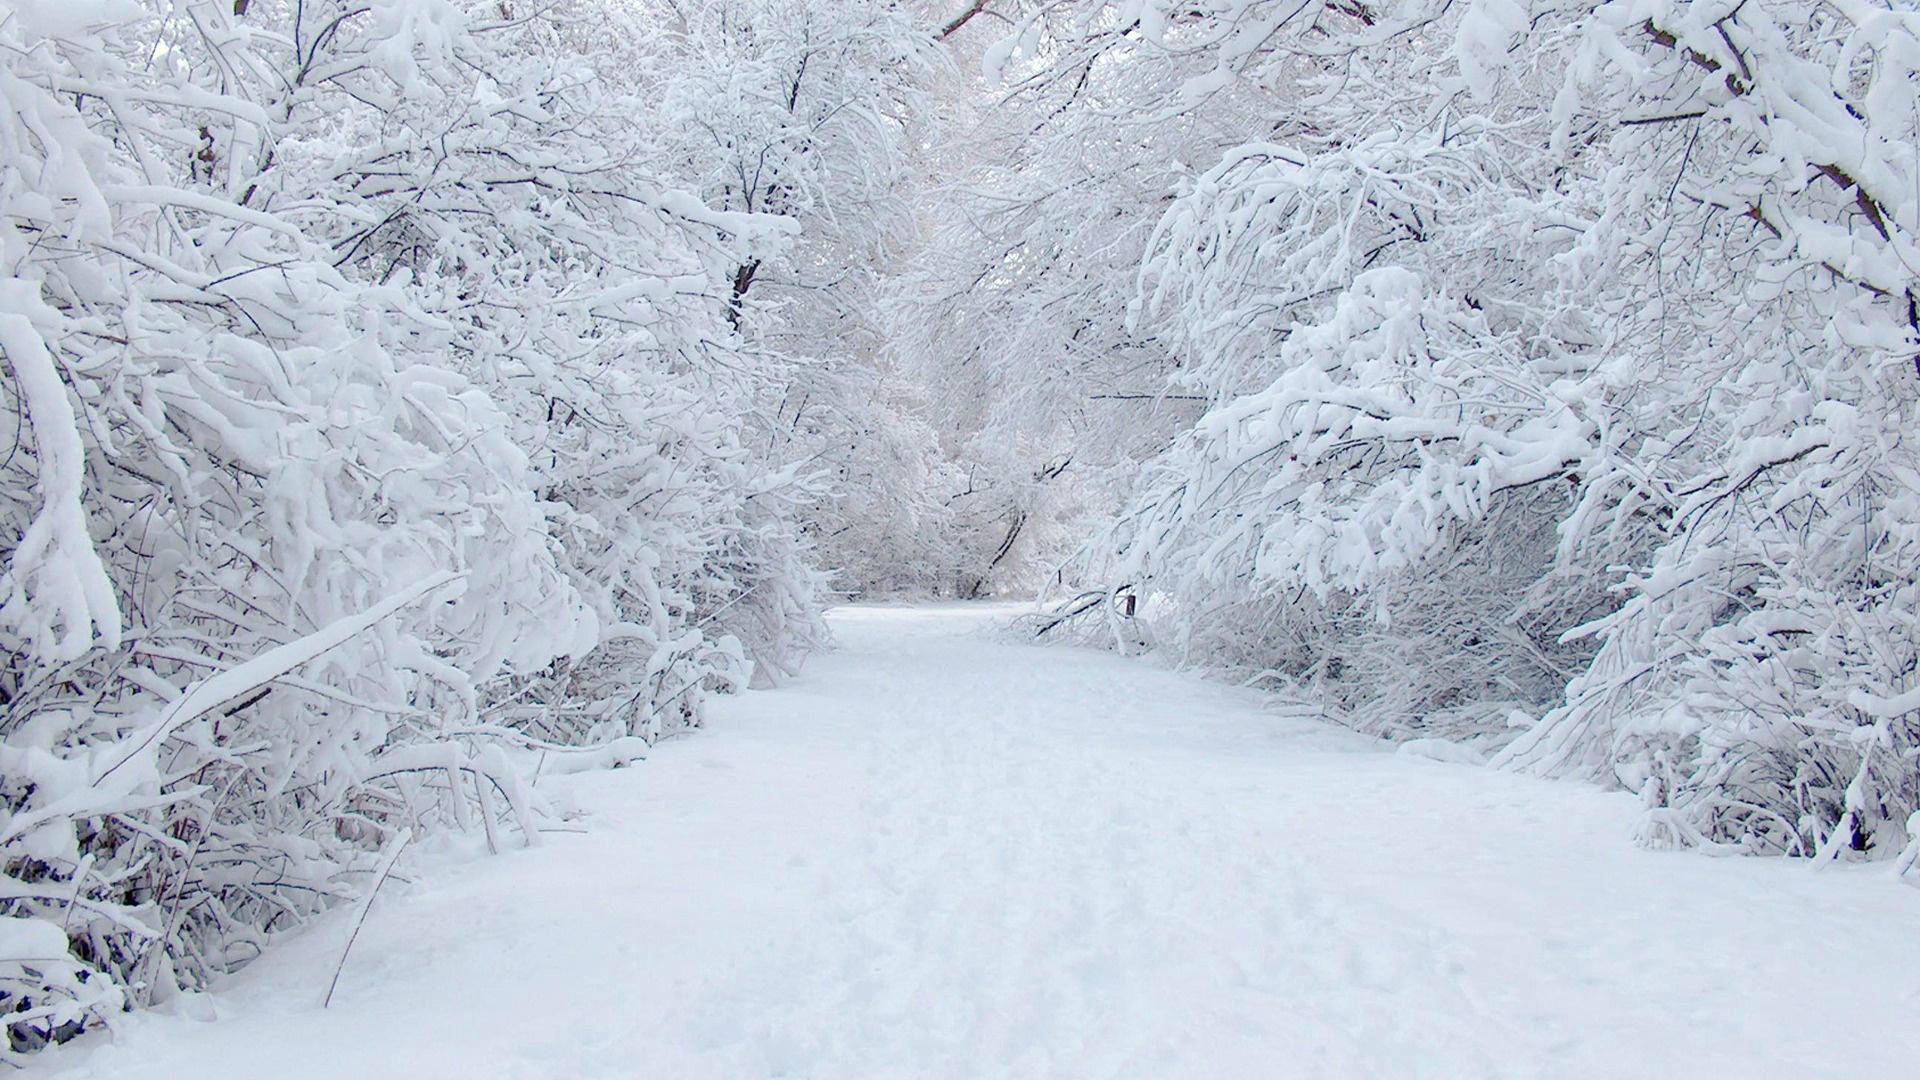 Snow Winter Wallpaper Hd